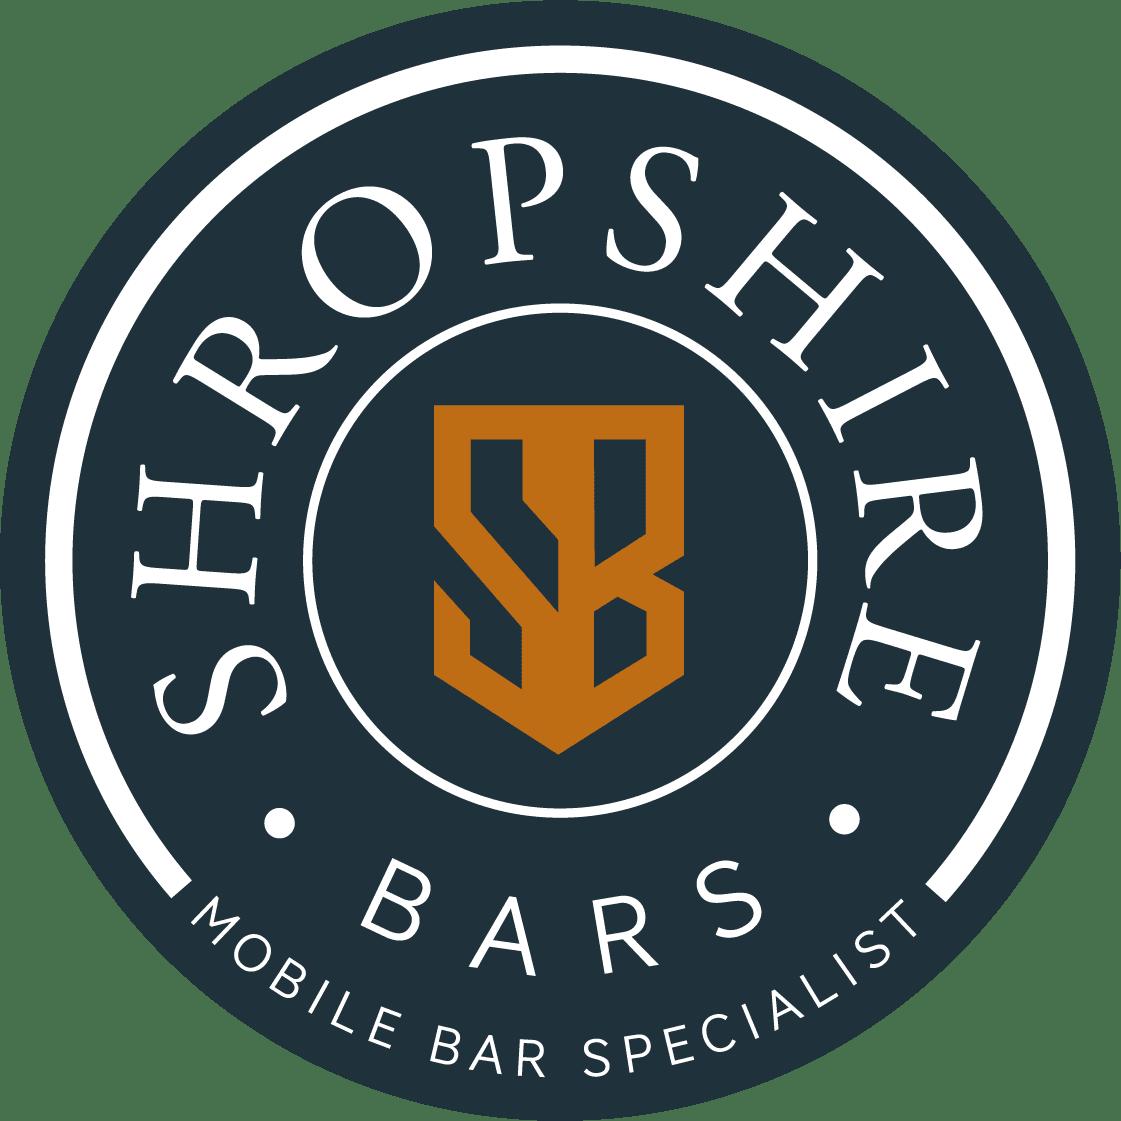 Shropshire mobile Bars